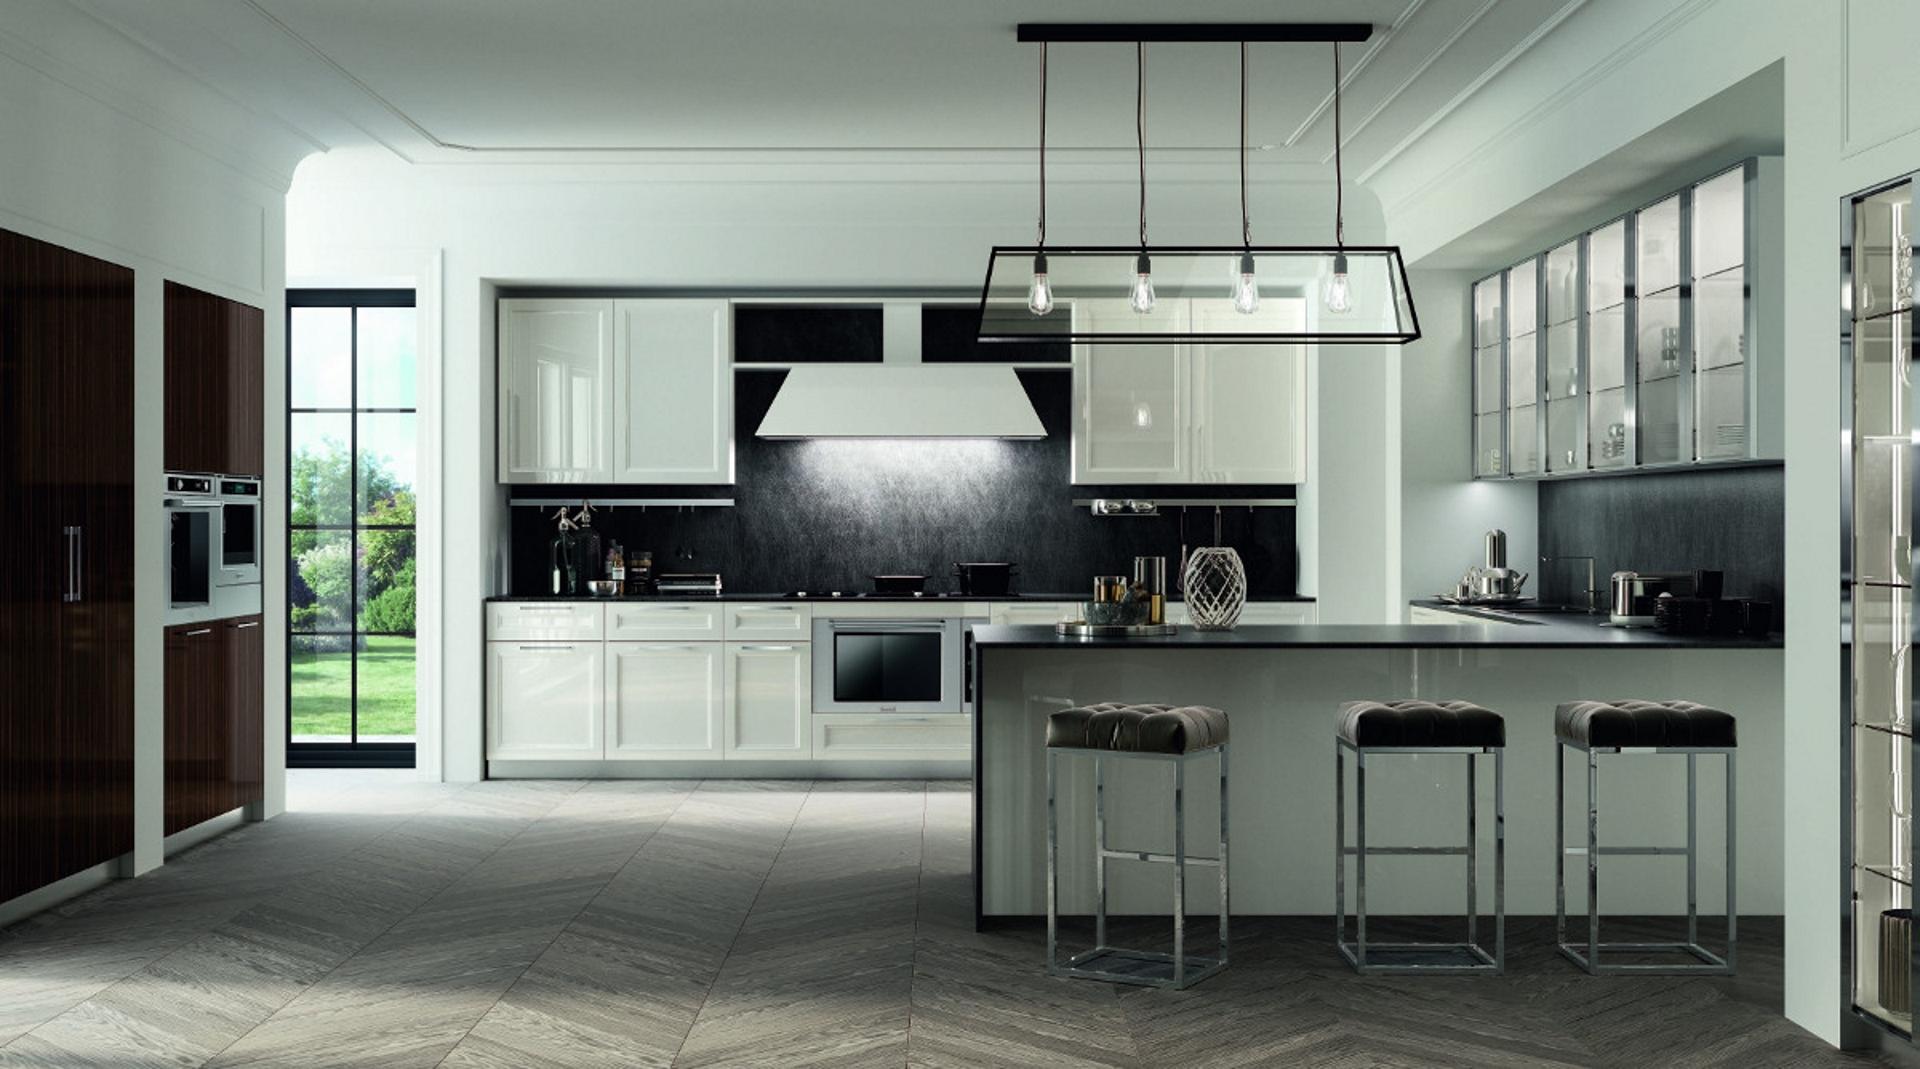 Marilyn cucina dal design cosmopolita cucine composit - Cucine lussuose moderne ...